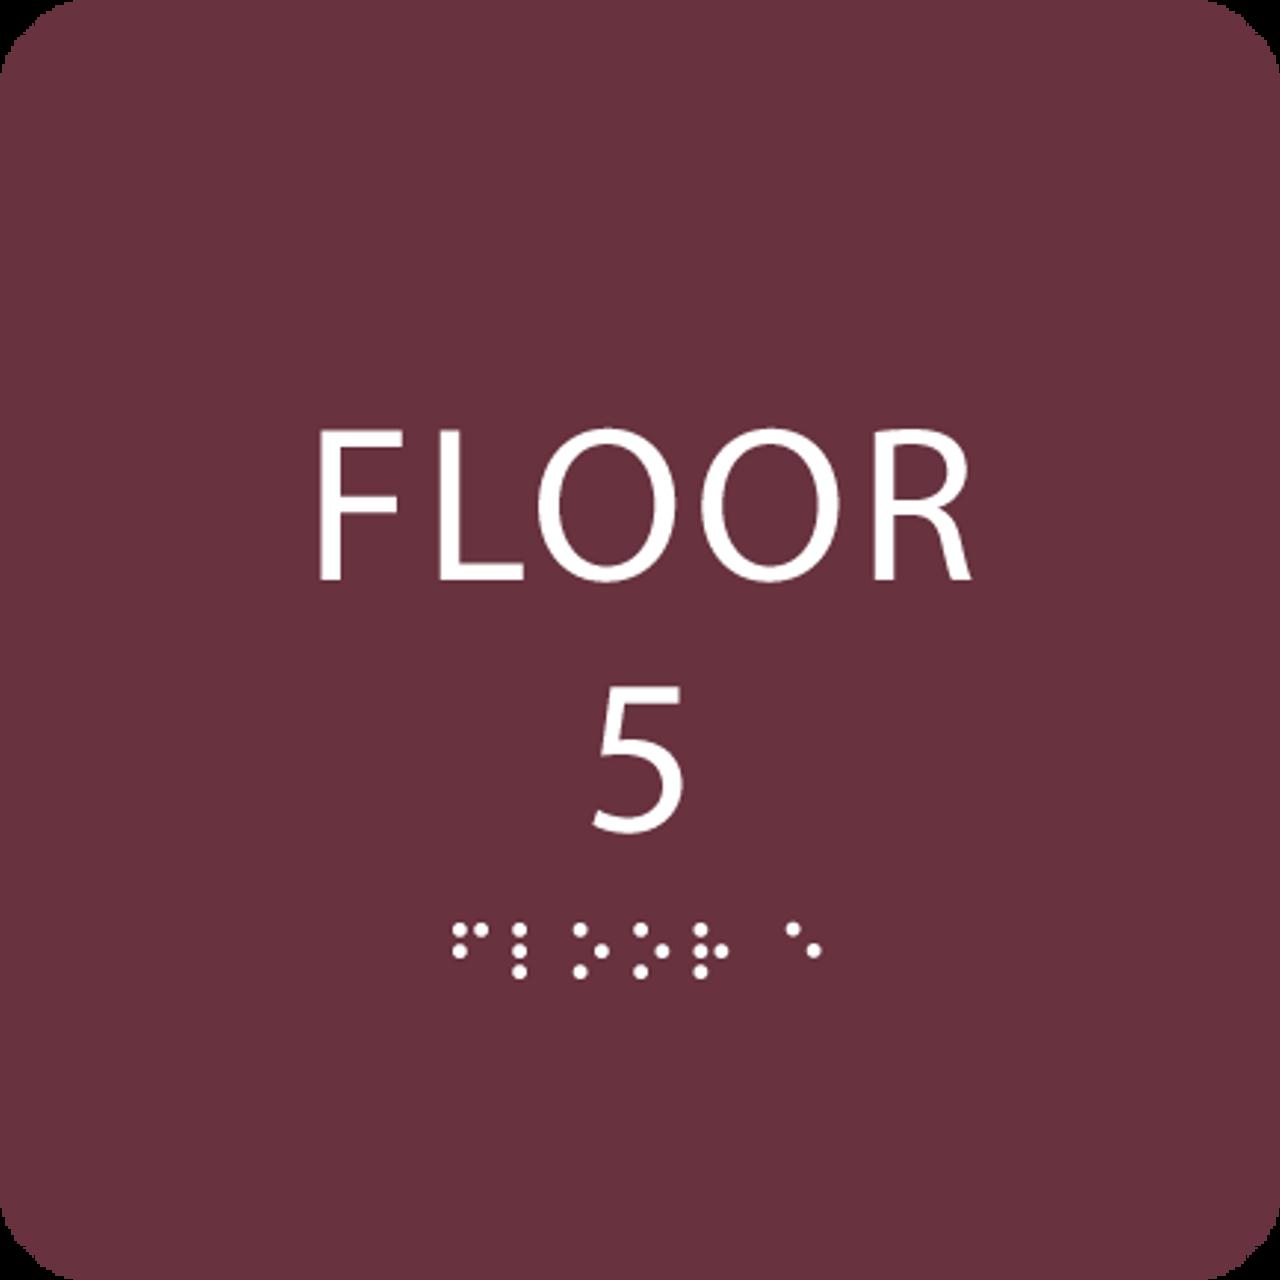 Burgundy Floor 5 Level Identification Sign